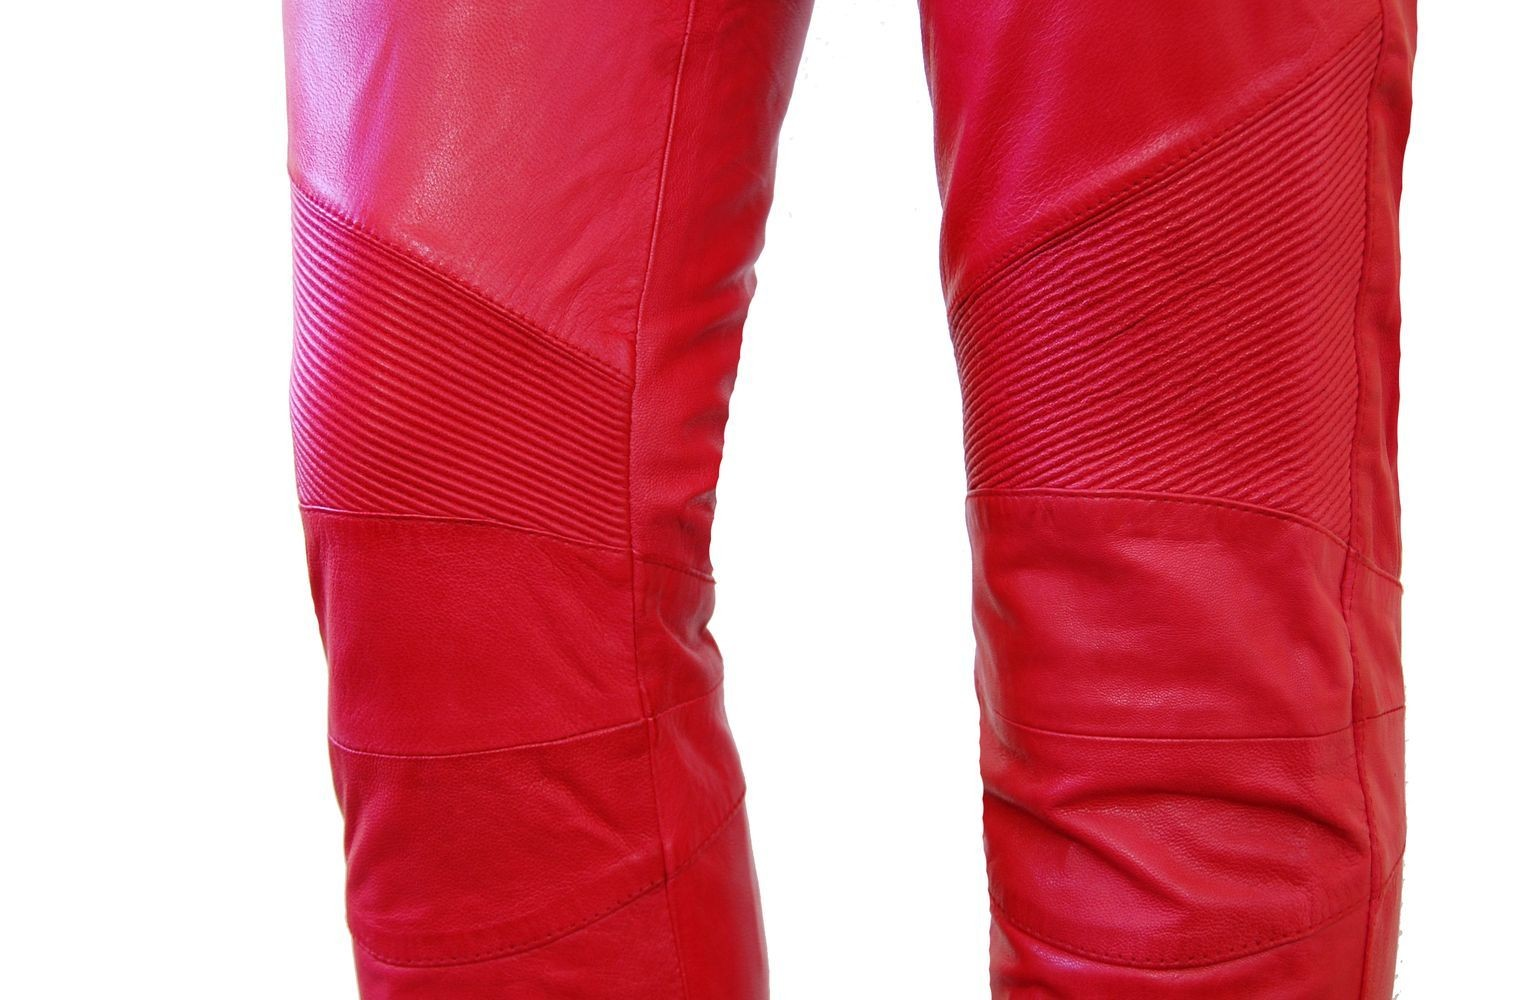 Damen-Lederhose Donna, Rot in 6 Farben, Bild 3